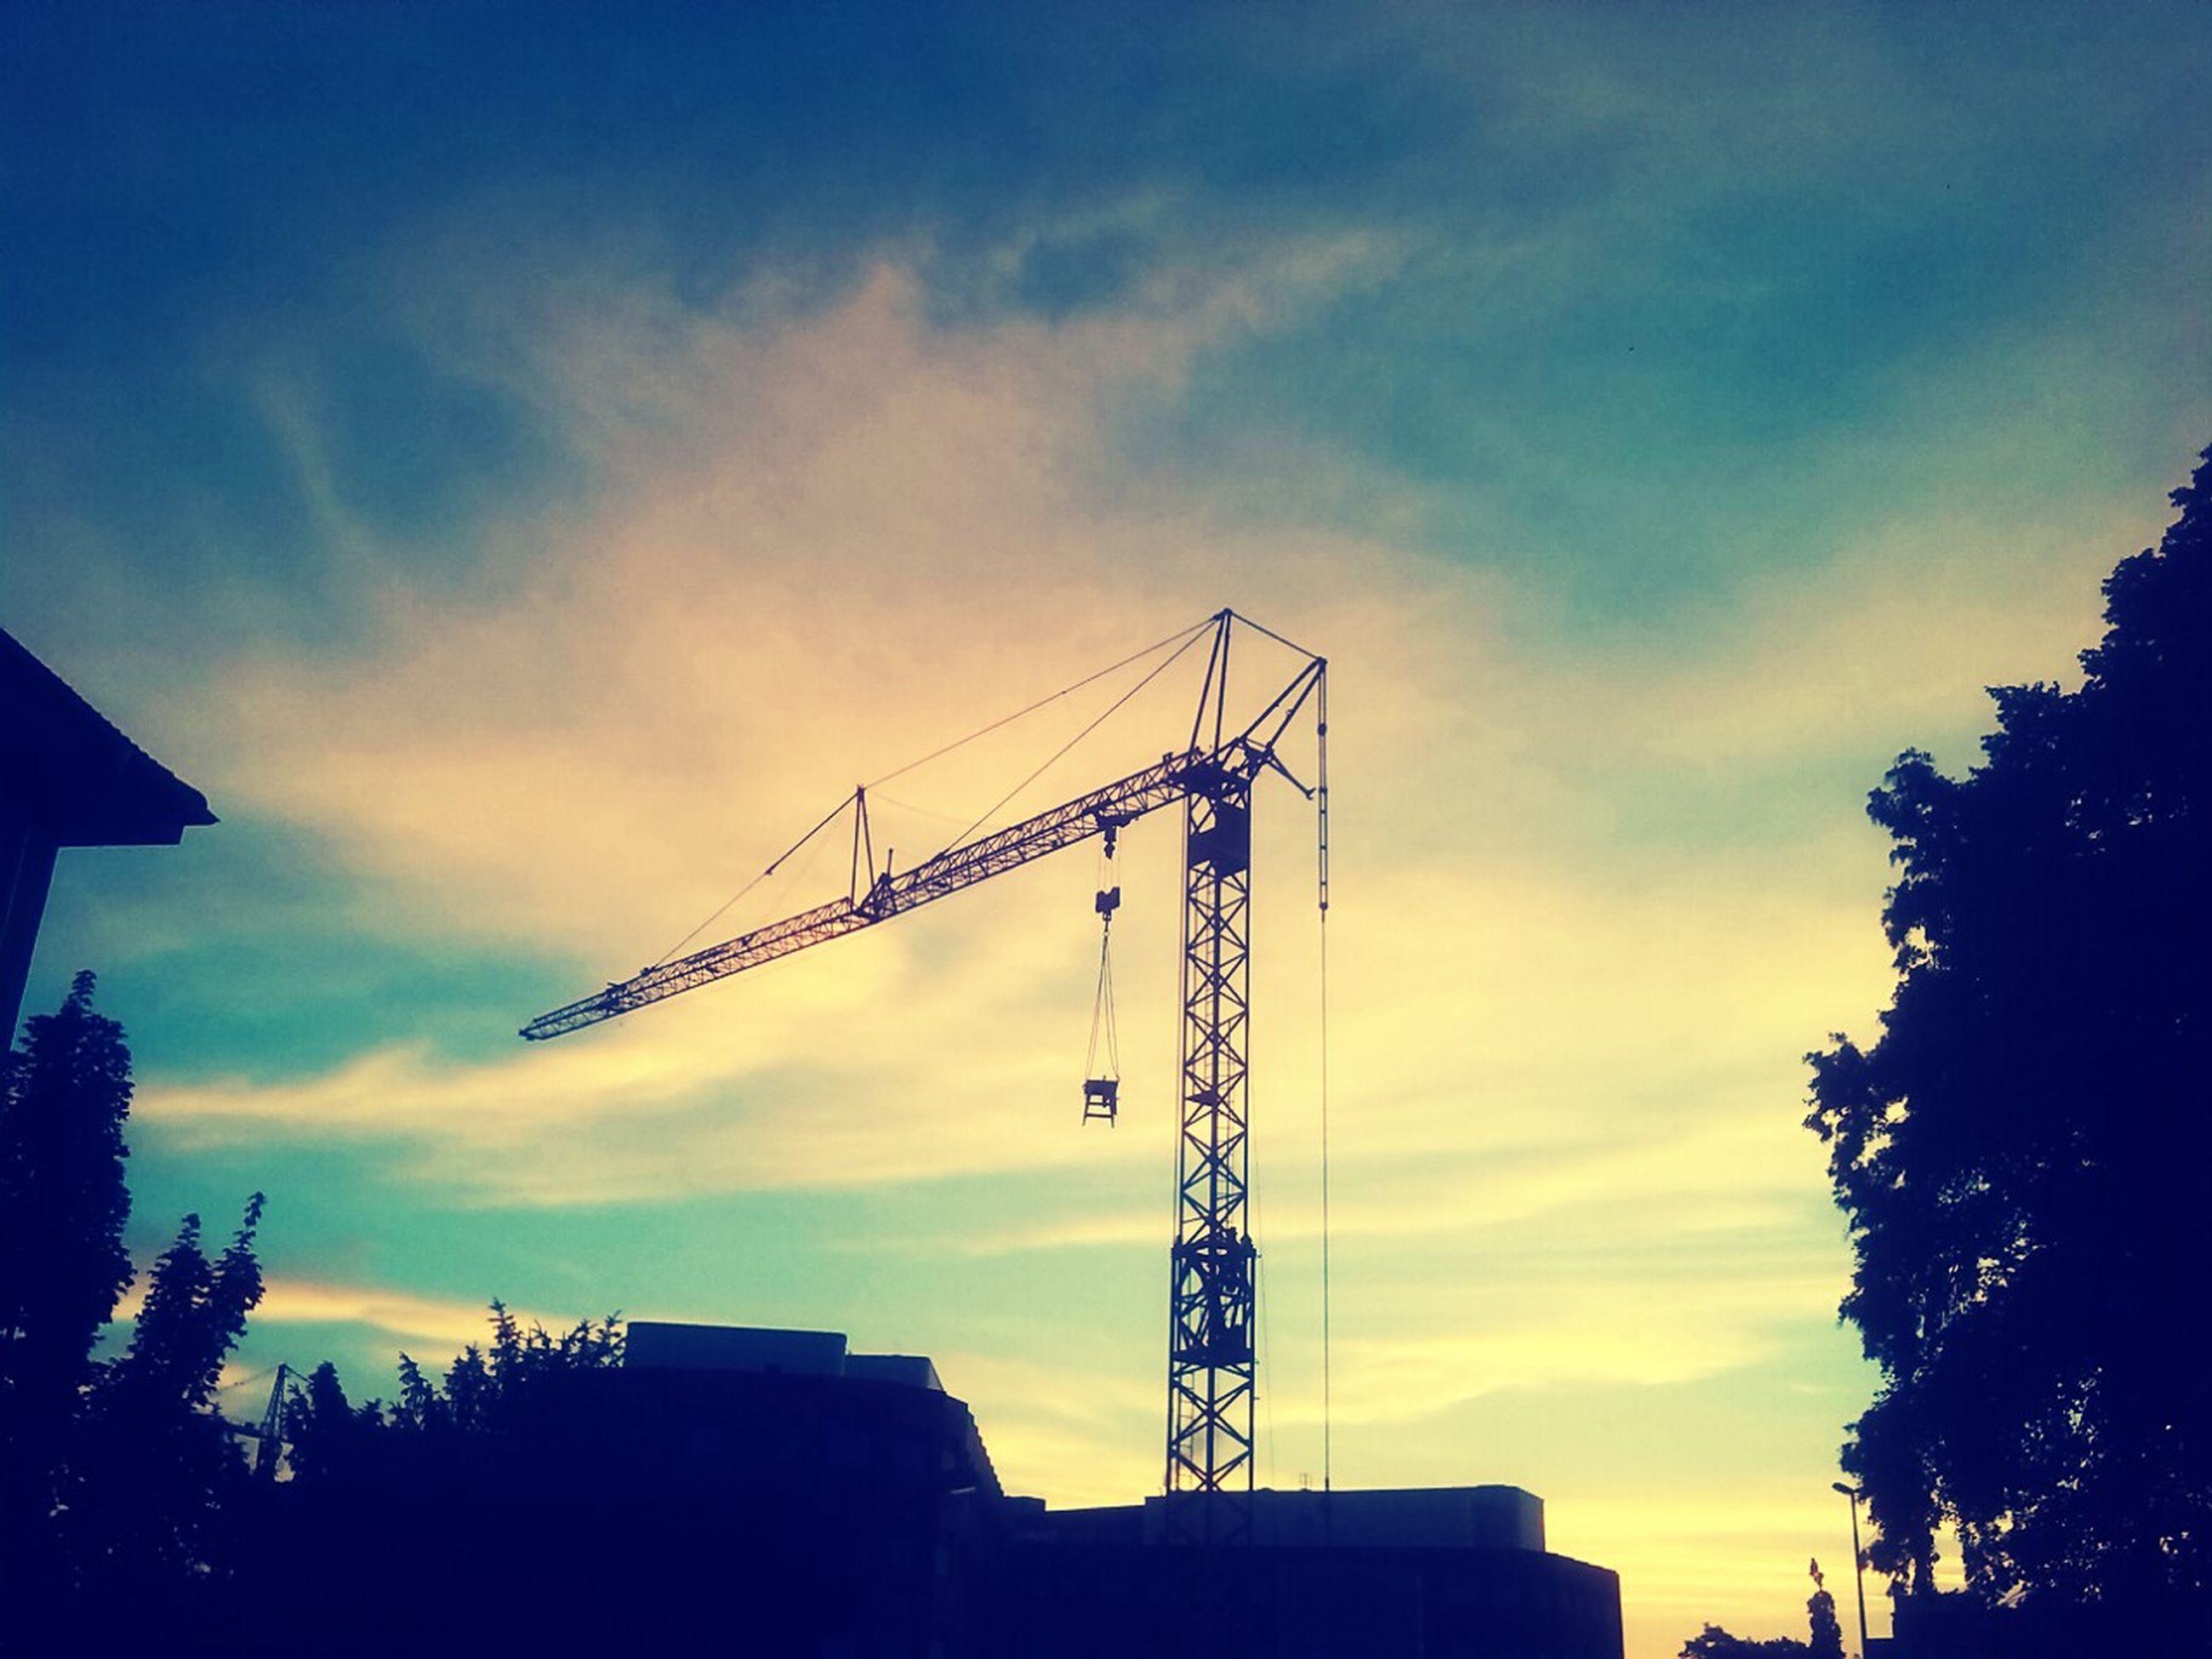 sky, low angle view, silhouette, sunset, built structure, architecture, cloud - sky, building exterior, crane - construction machinery, construction site, cloud, development, dusk, crane, cloudy, outdoors, no people, connection, construction, tree